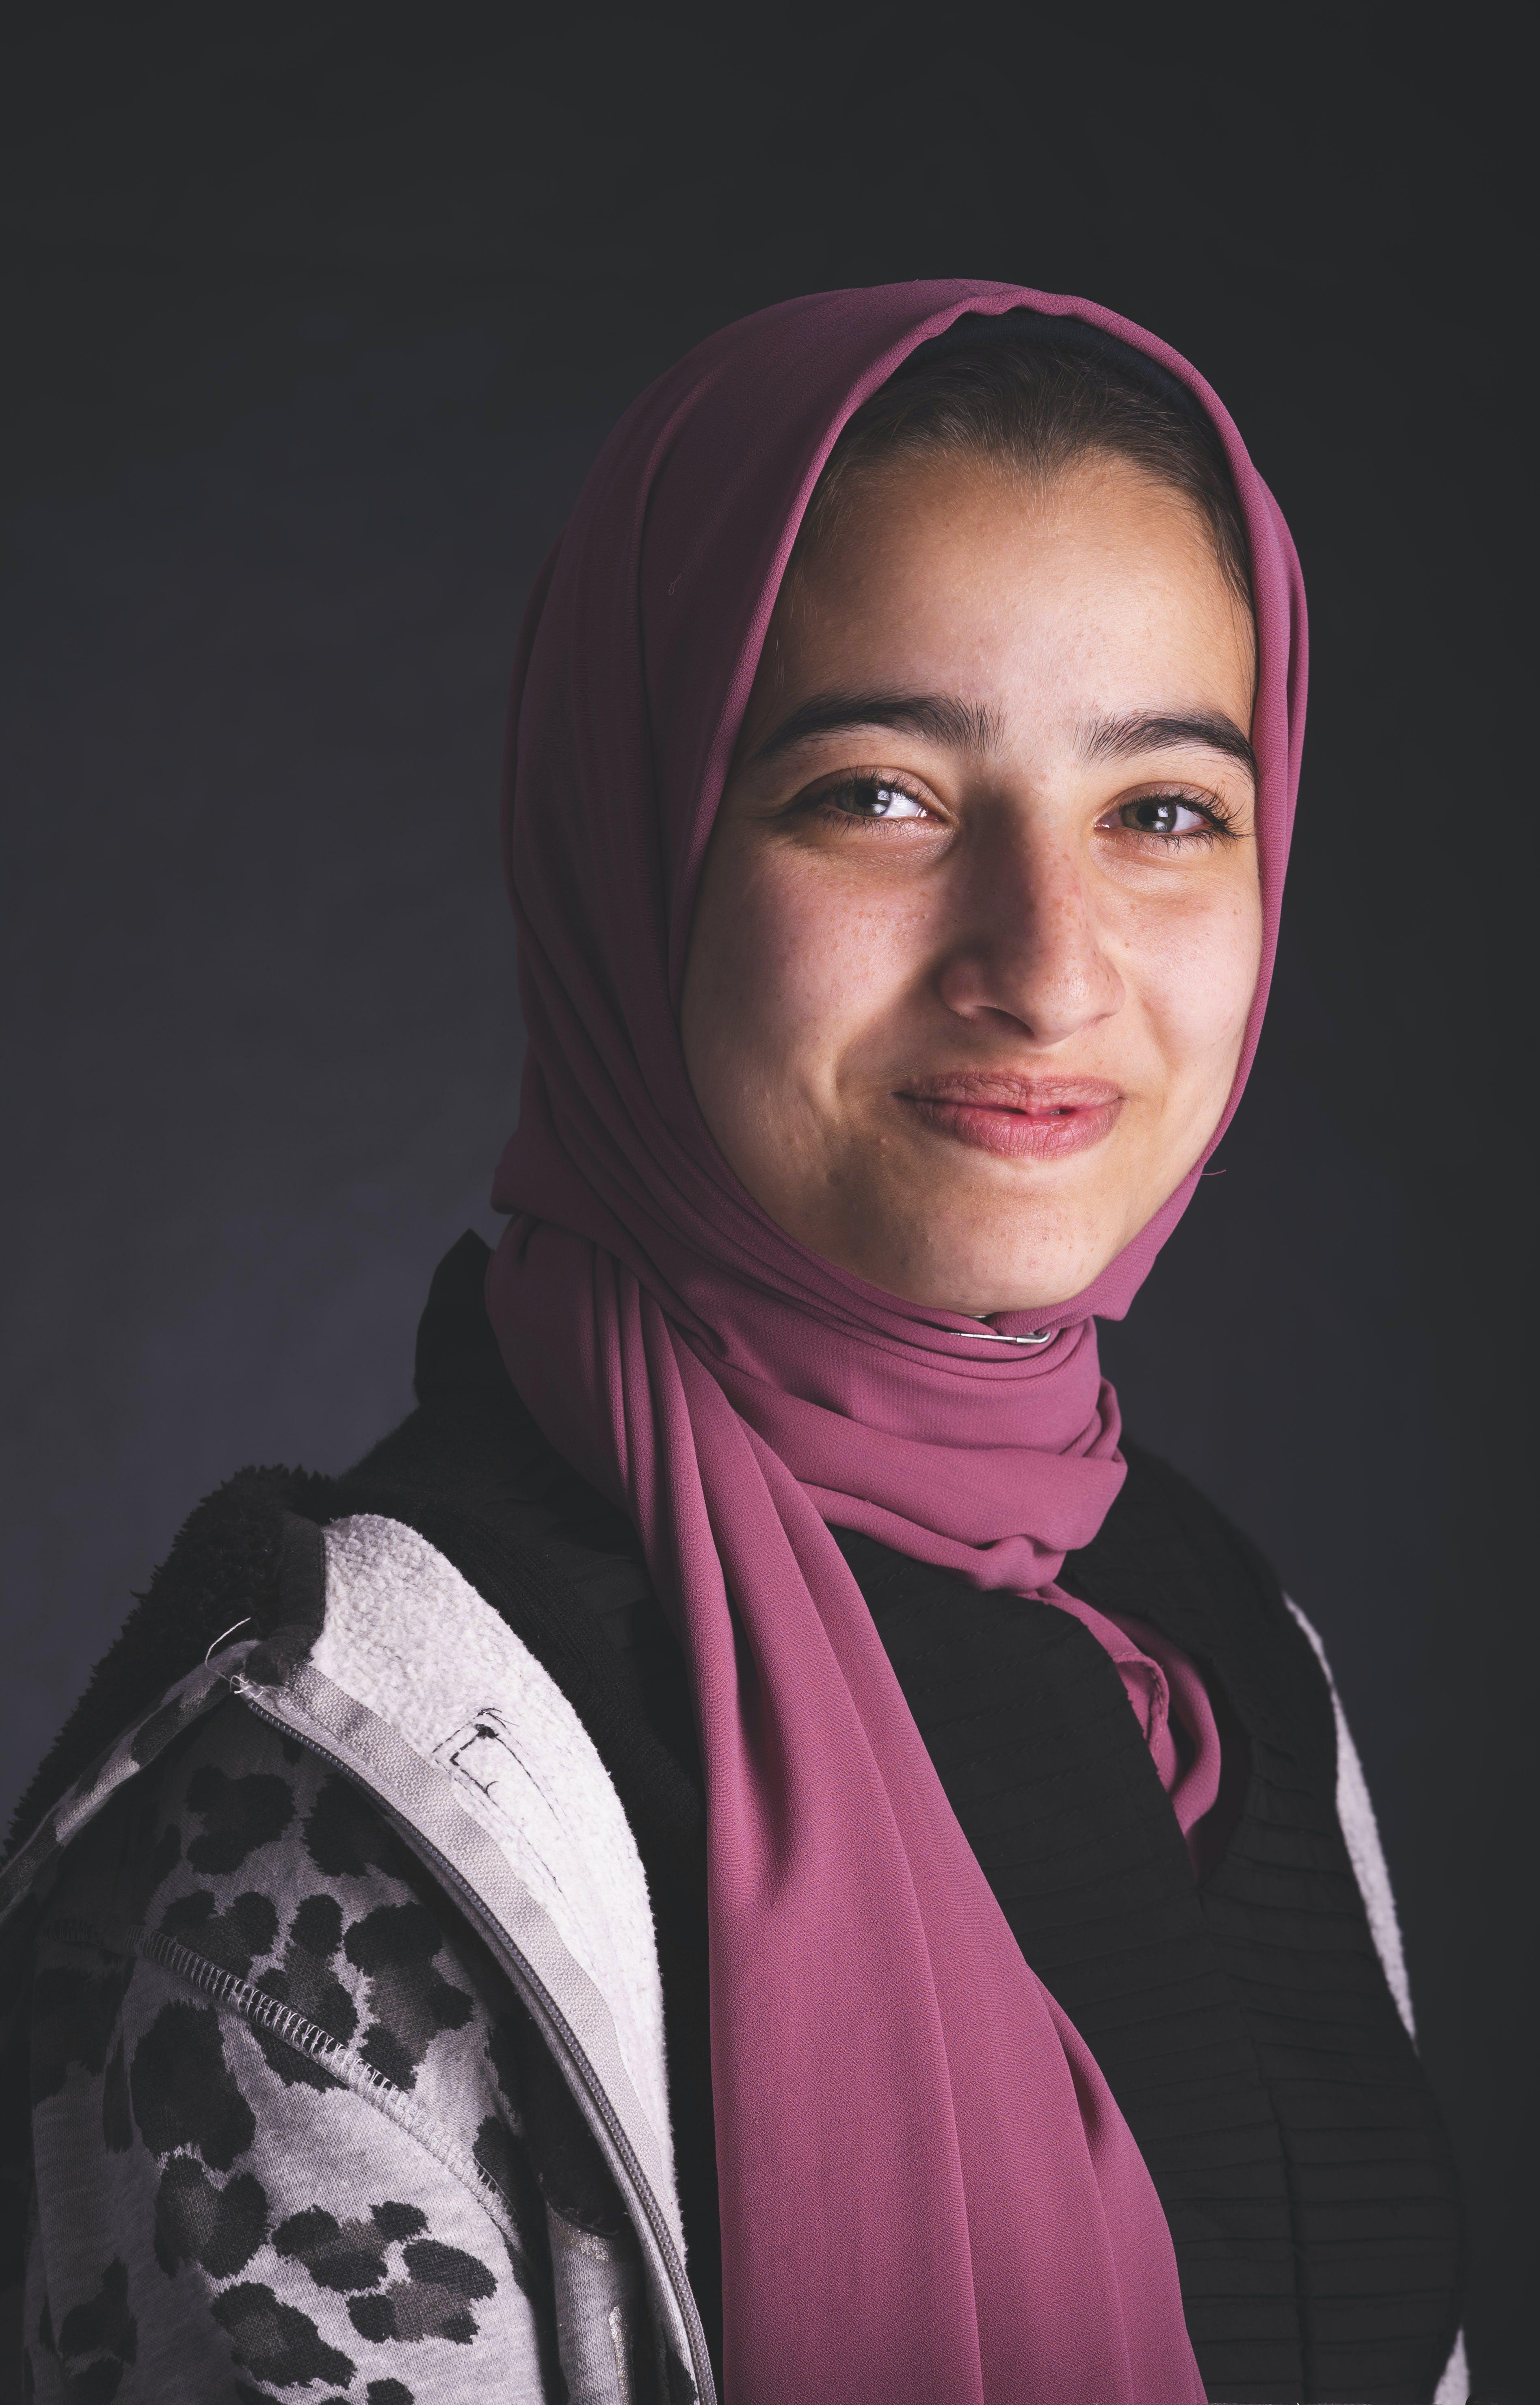 Woman Wearing Pink Hijab